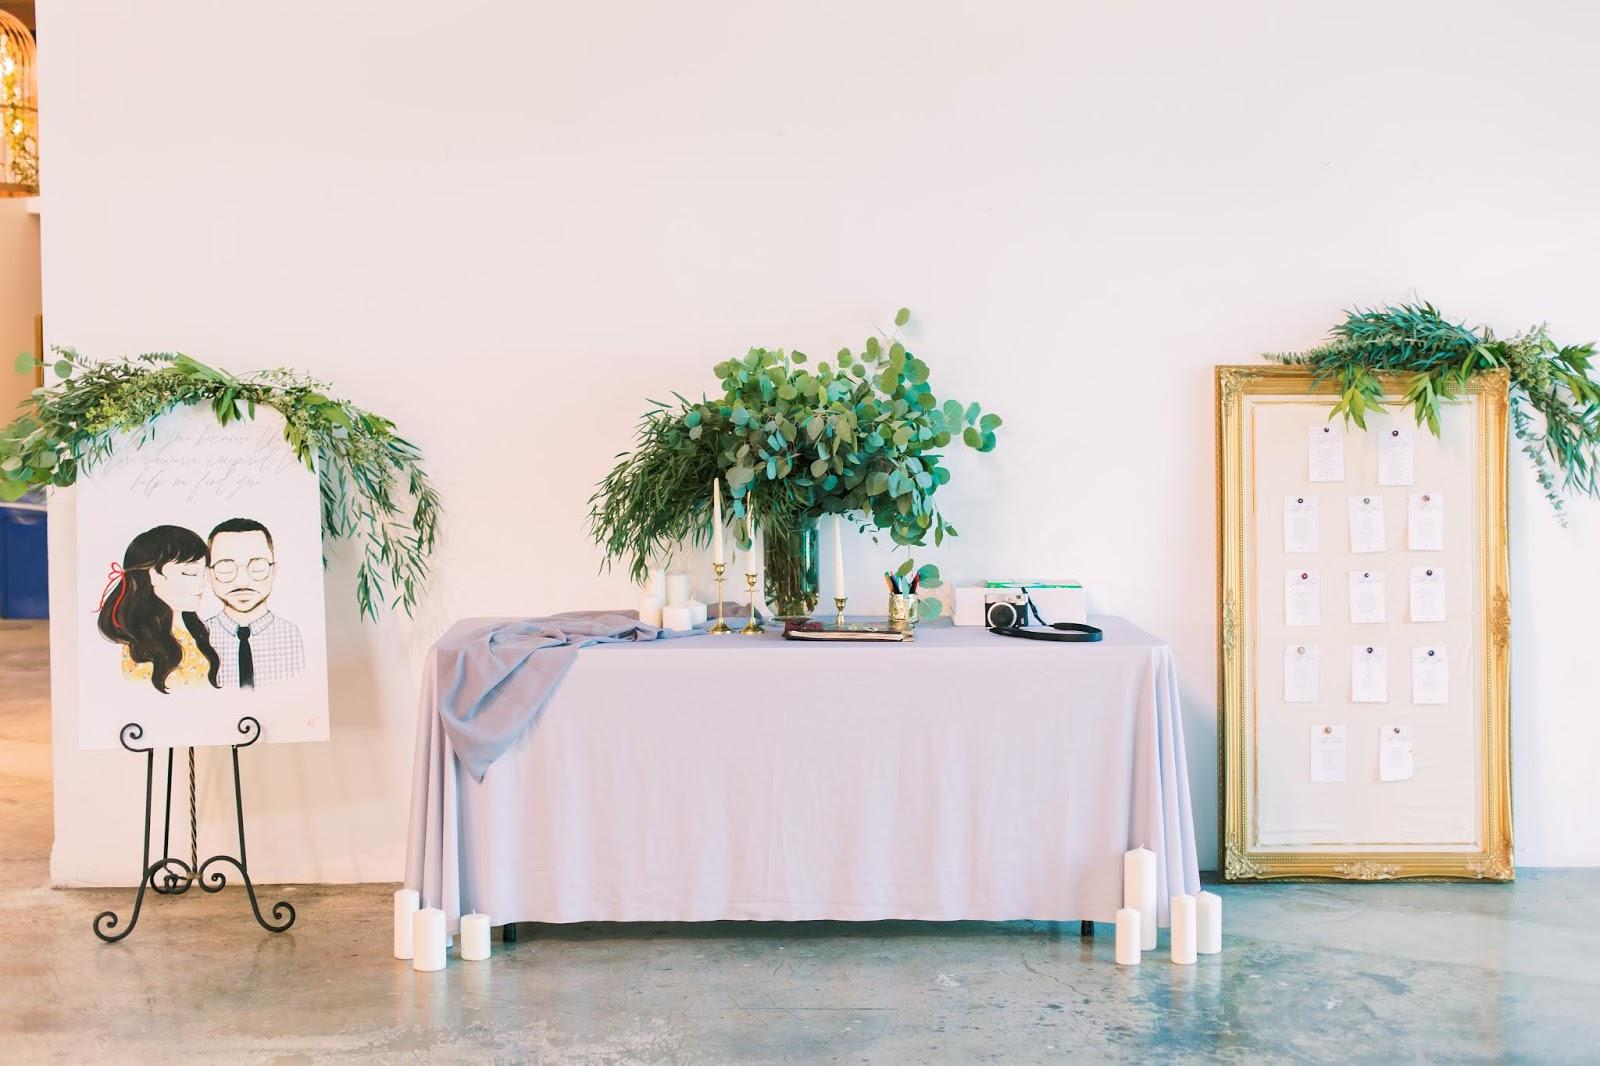 las vegas wedding, caricature, guestbook, seating chart